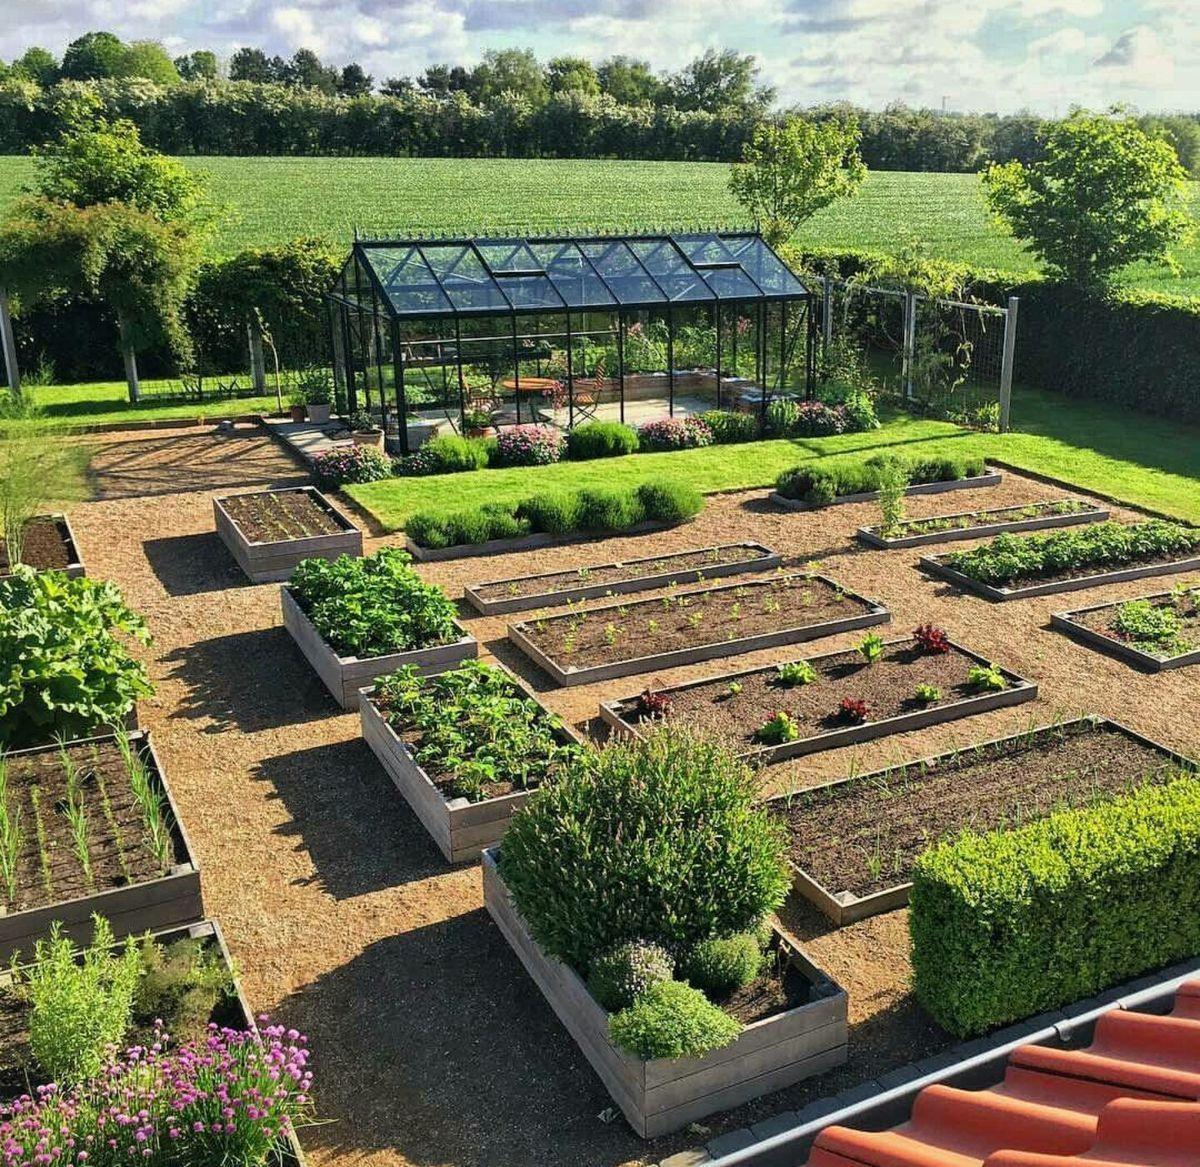 Potager Garden Design Ideas: Gorgeous Conservatory Greenhouse Love Potager Layout So